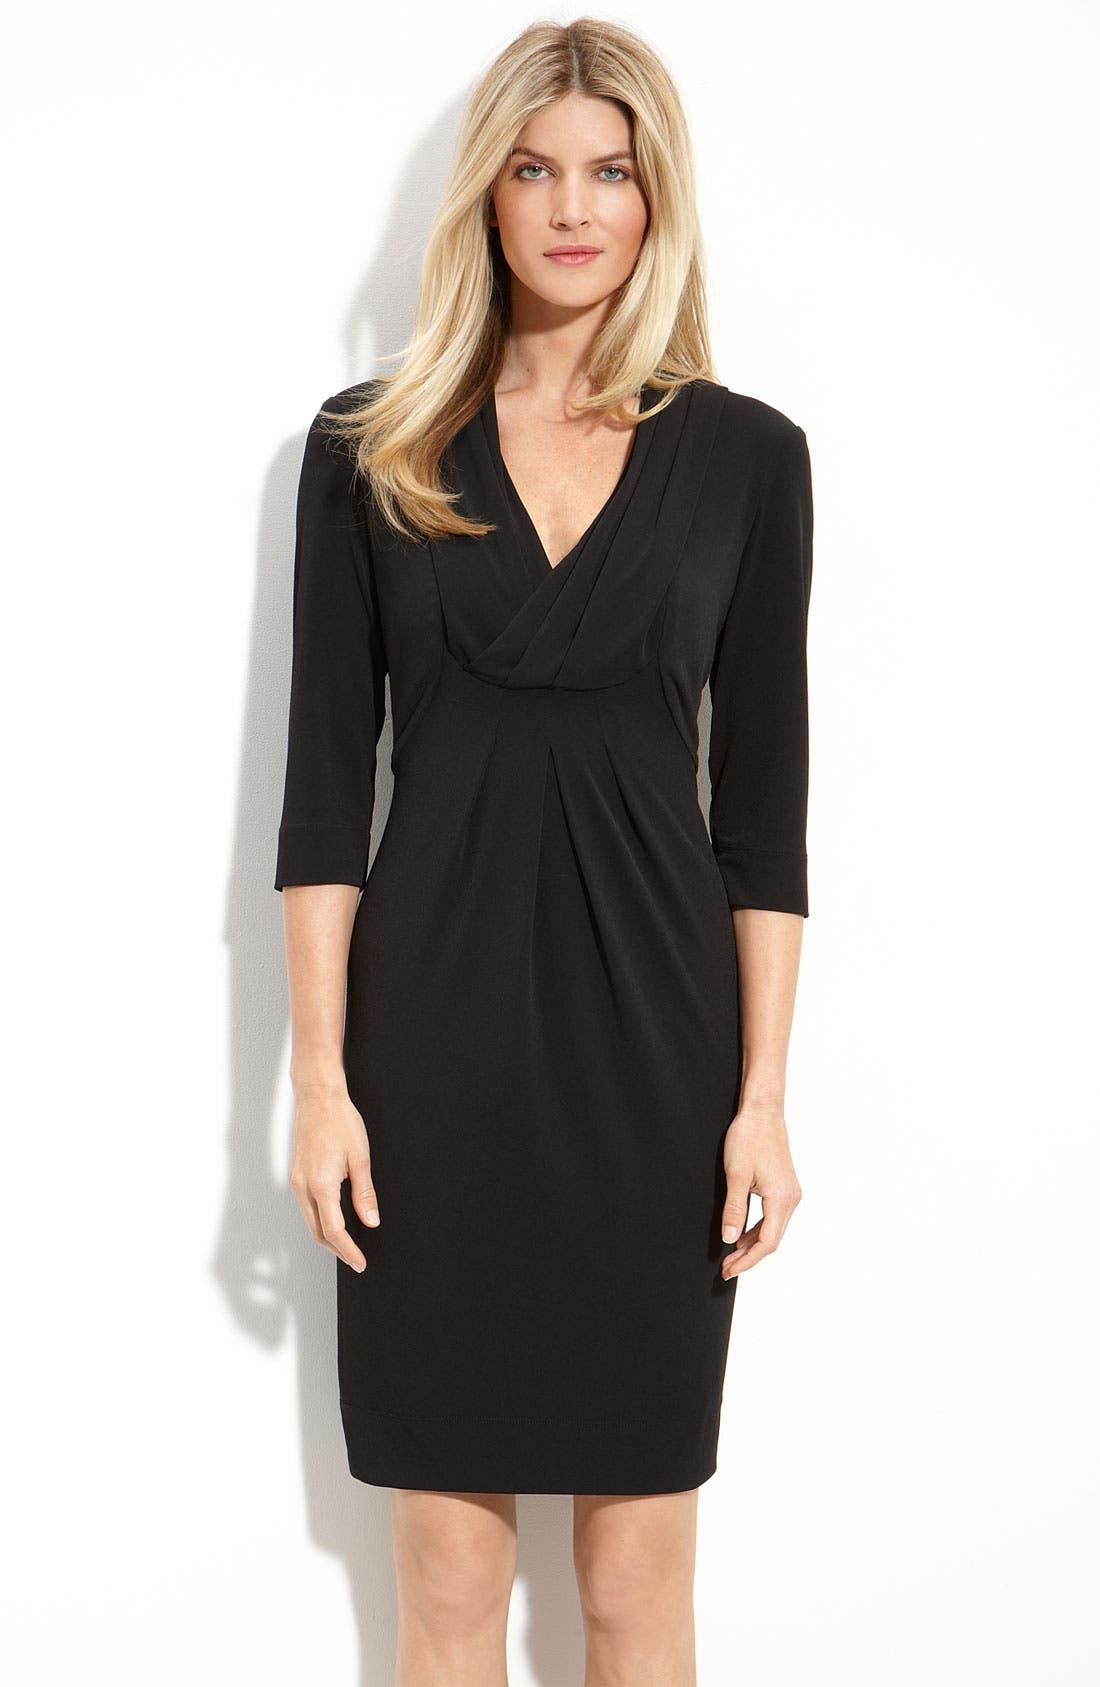 Alternate Image 1 Selected - Donna Ricco Drape V-Neck Jersey Dress (Regular & Petite)